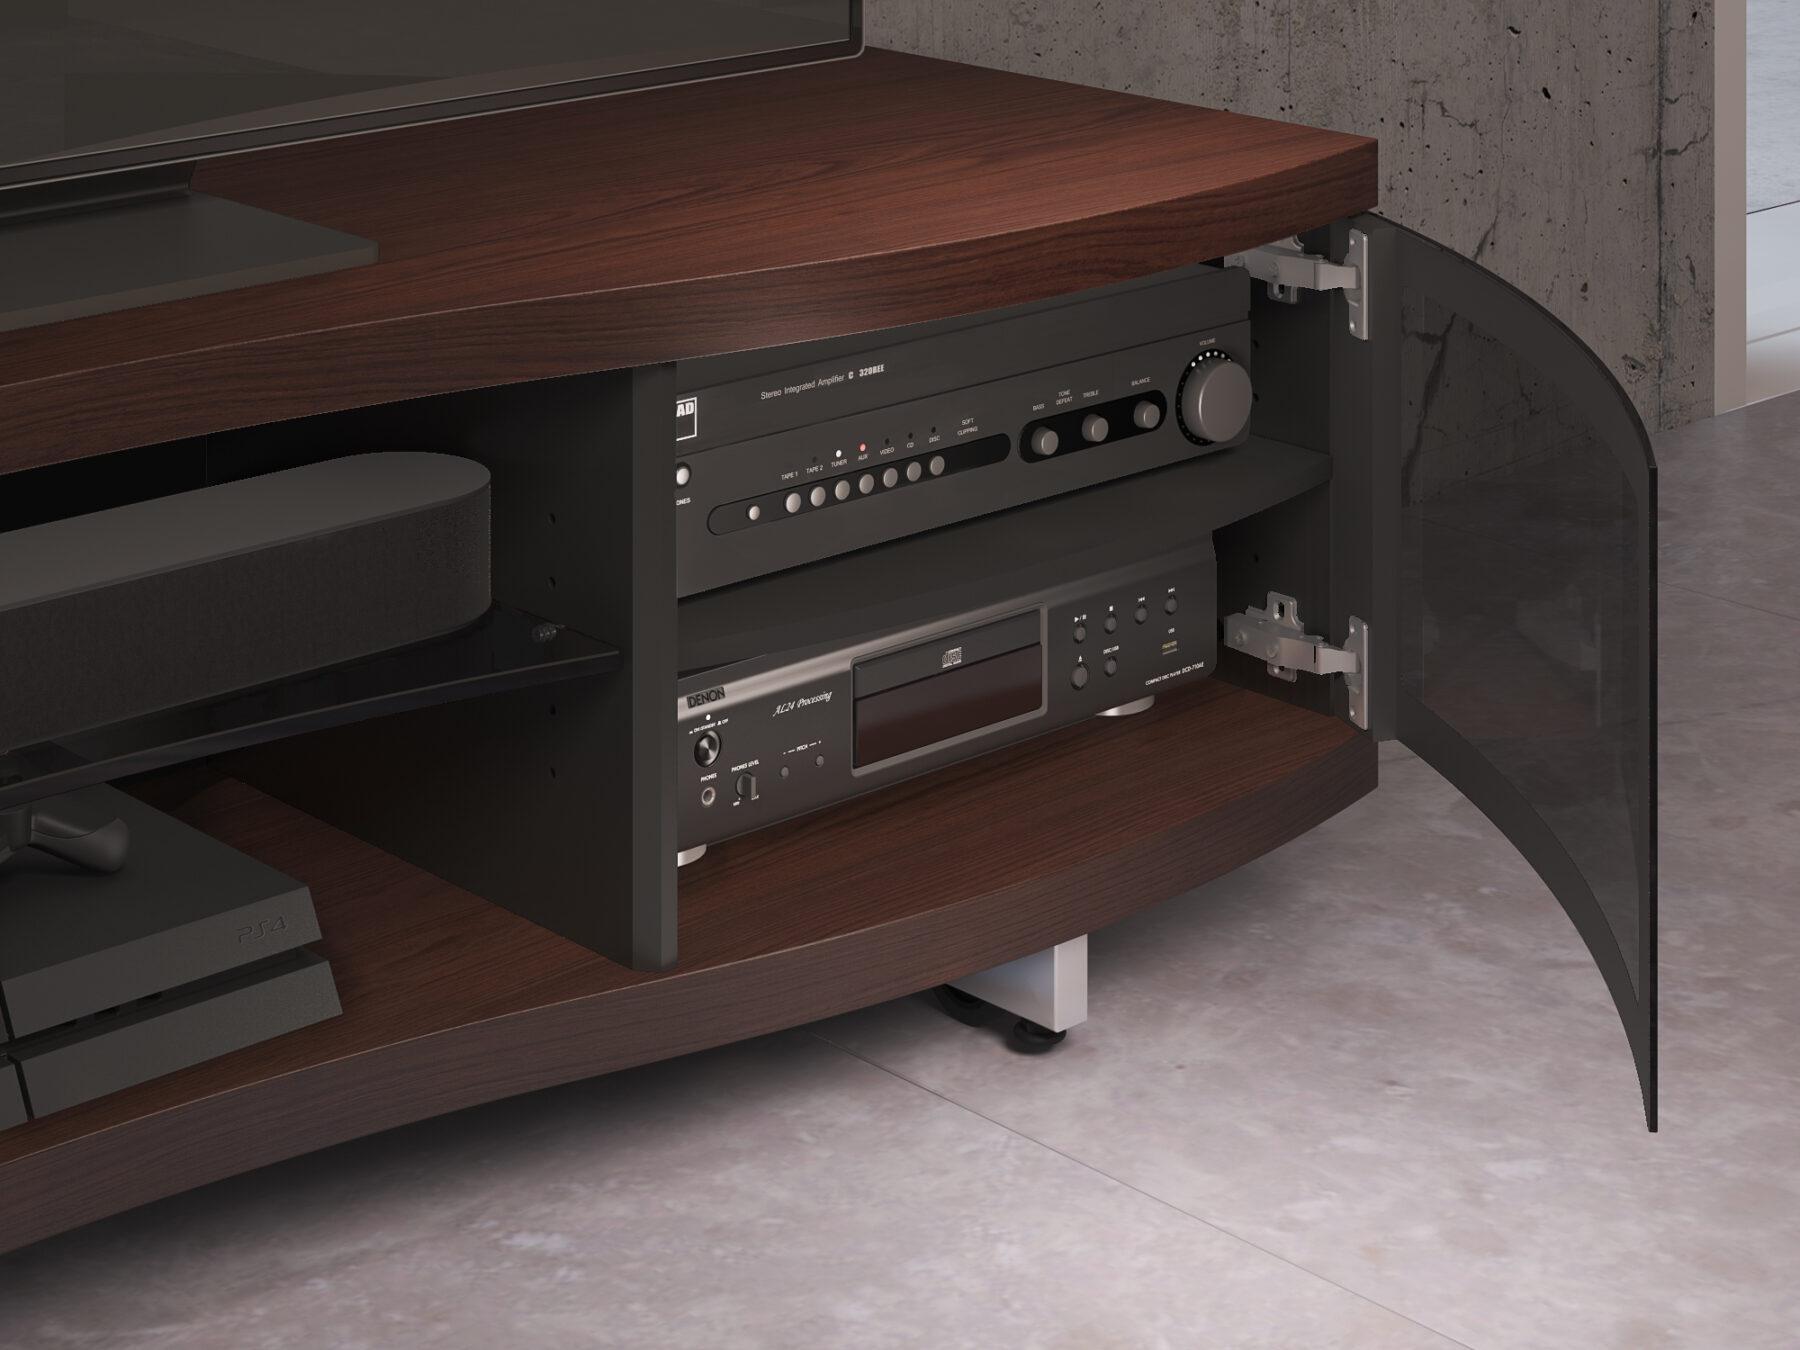 ola-8137-chocolate-bdi-modern-tv-cabinet-3